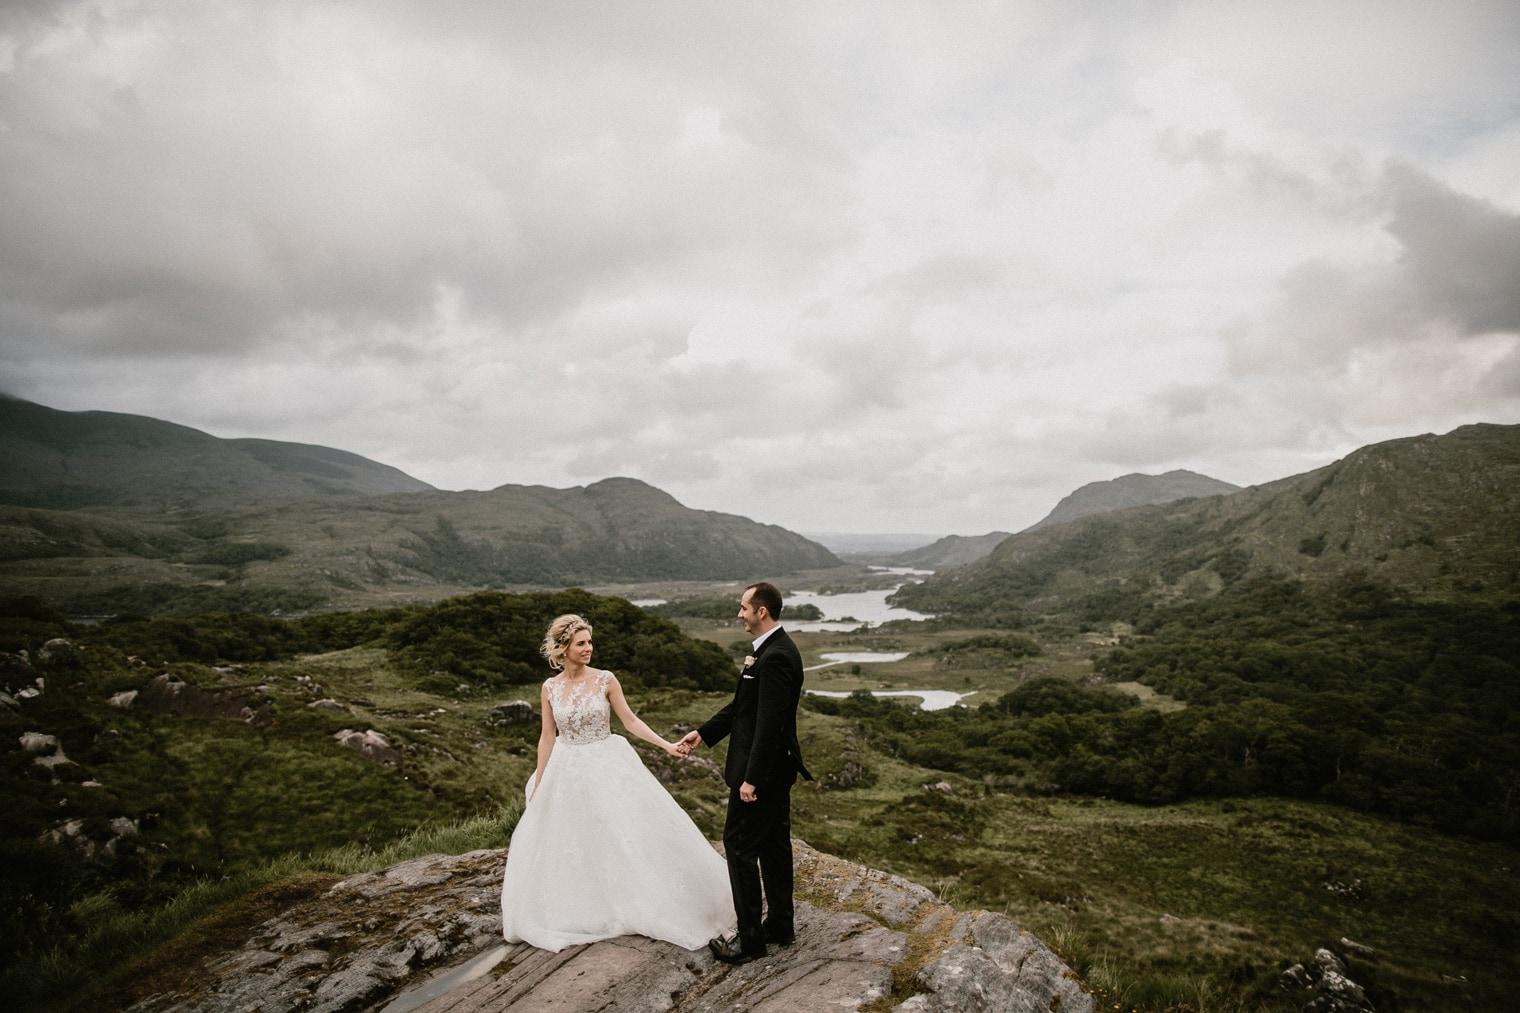 Wedding in Killarney National Park, Ireland